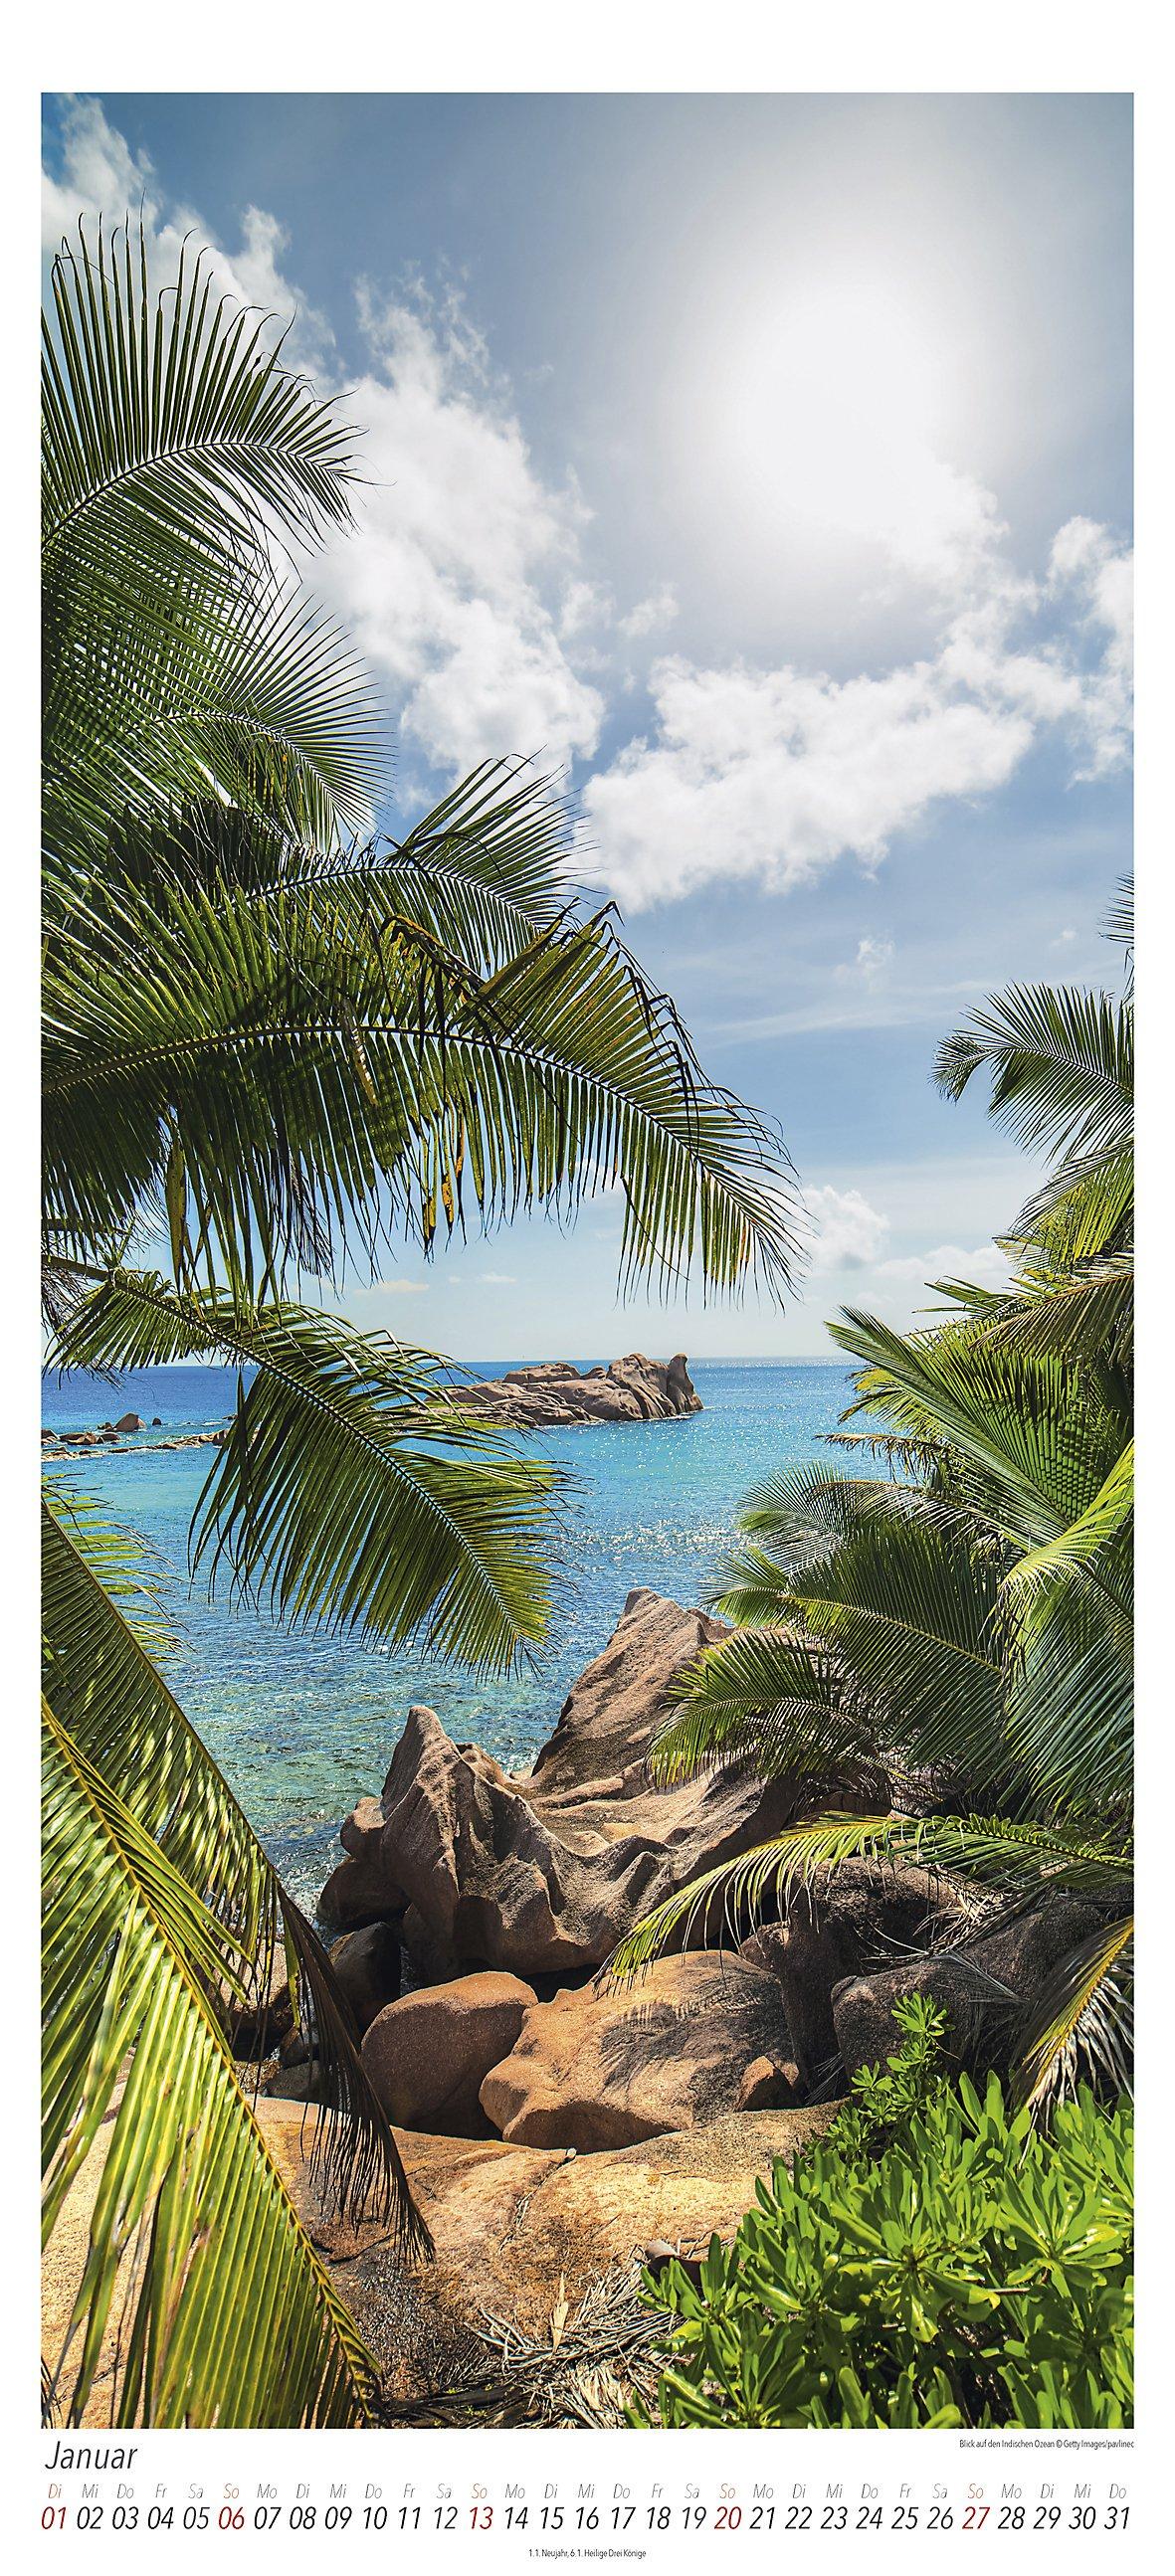 Sehnsuchtsort Insel Midi-Panoramakal. 2019 - Kalender bestellen